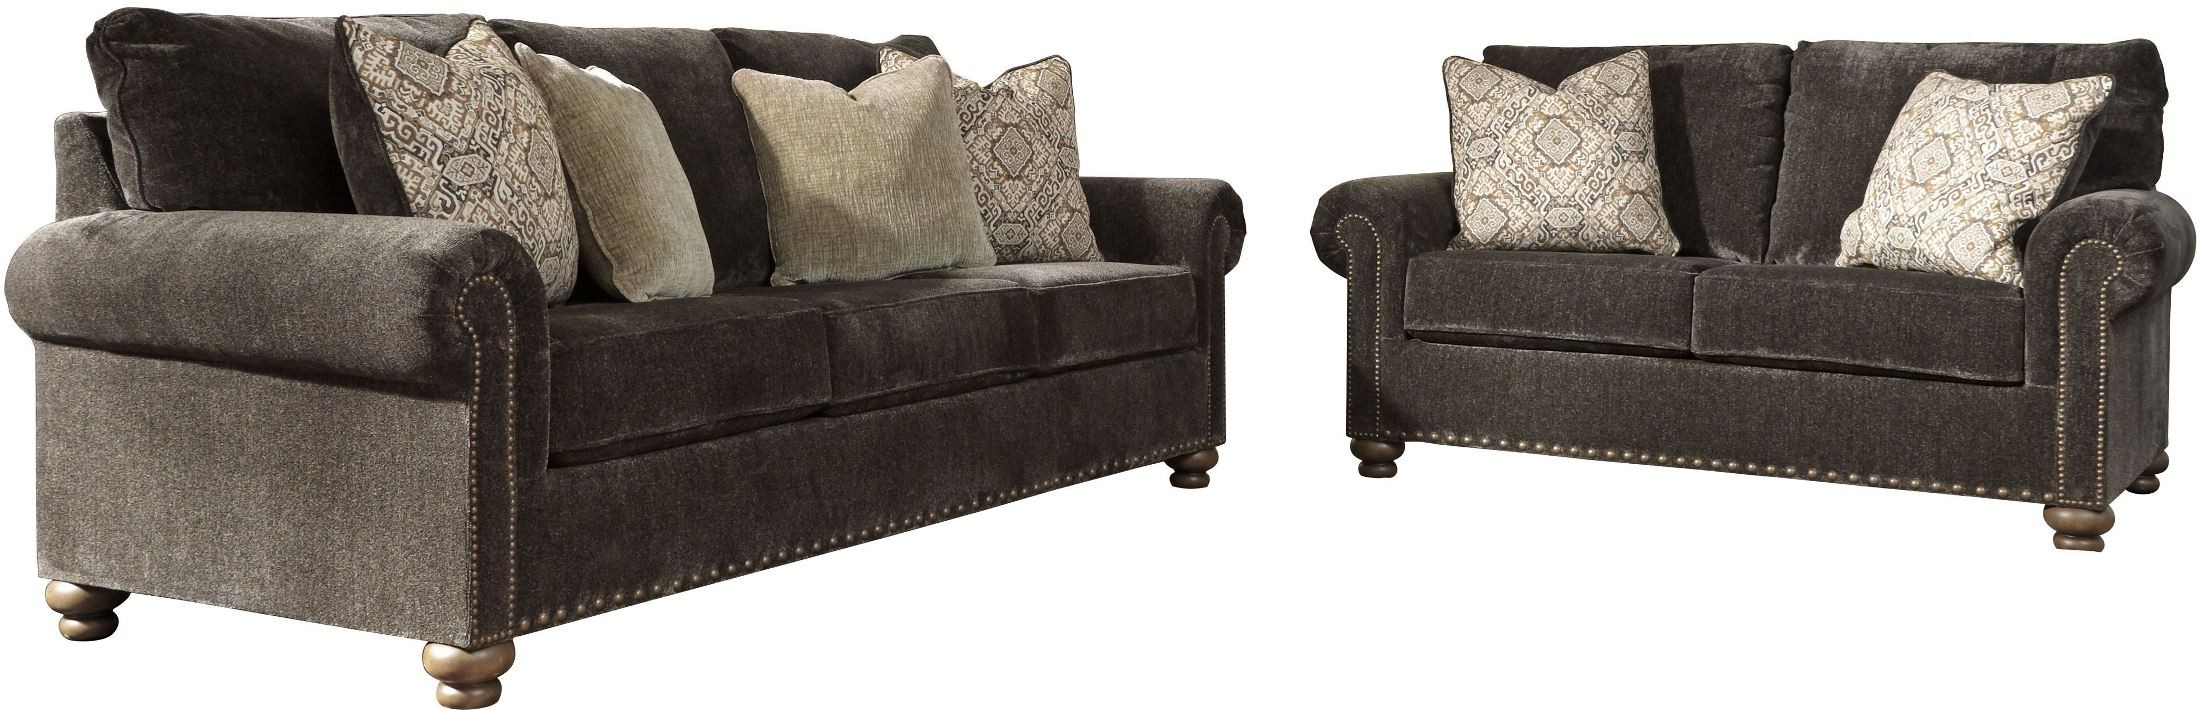 Signature Design by Ashley Stracelen Brown Queen Sofa Sleeper ...